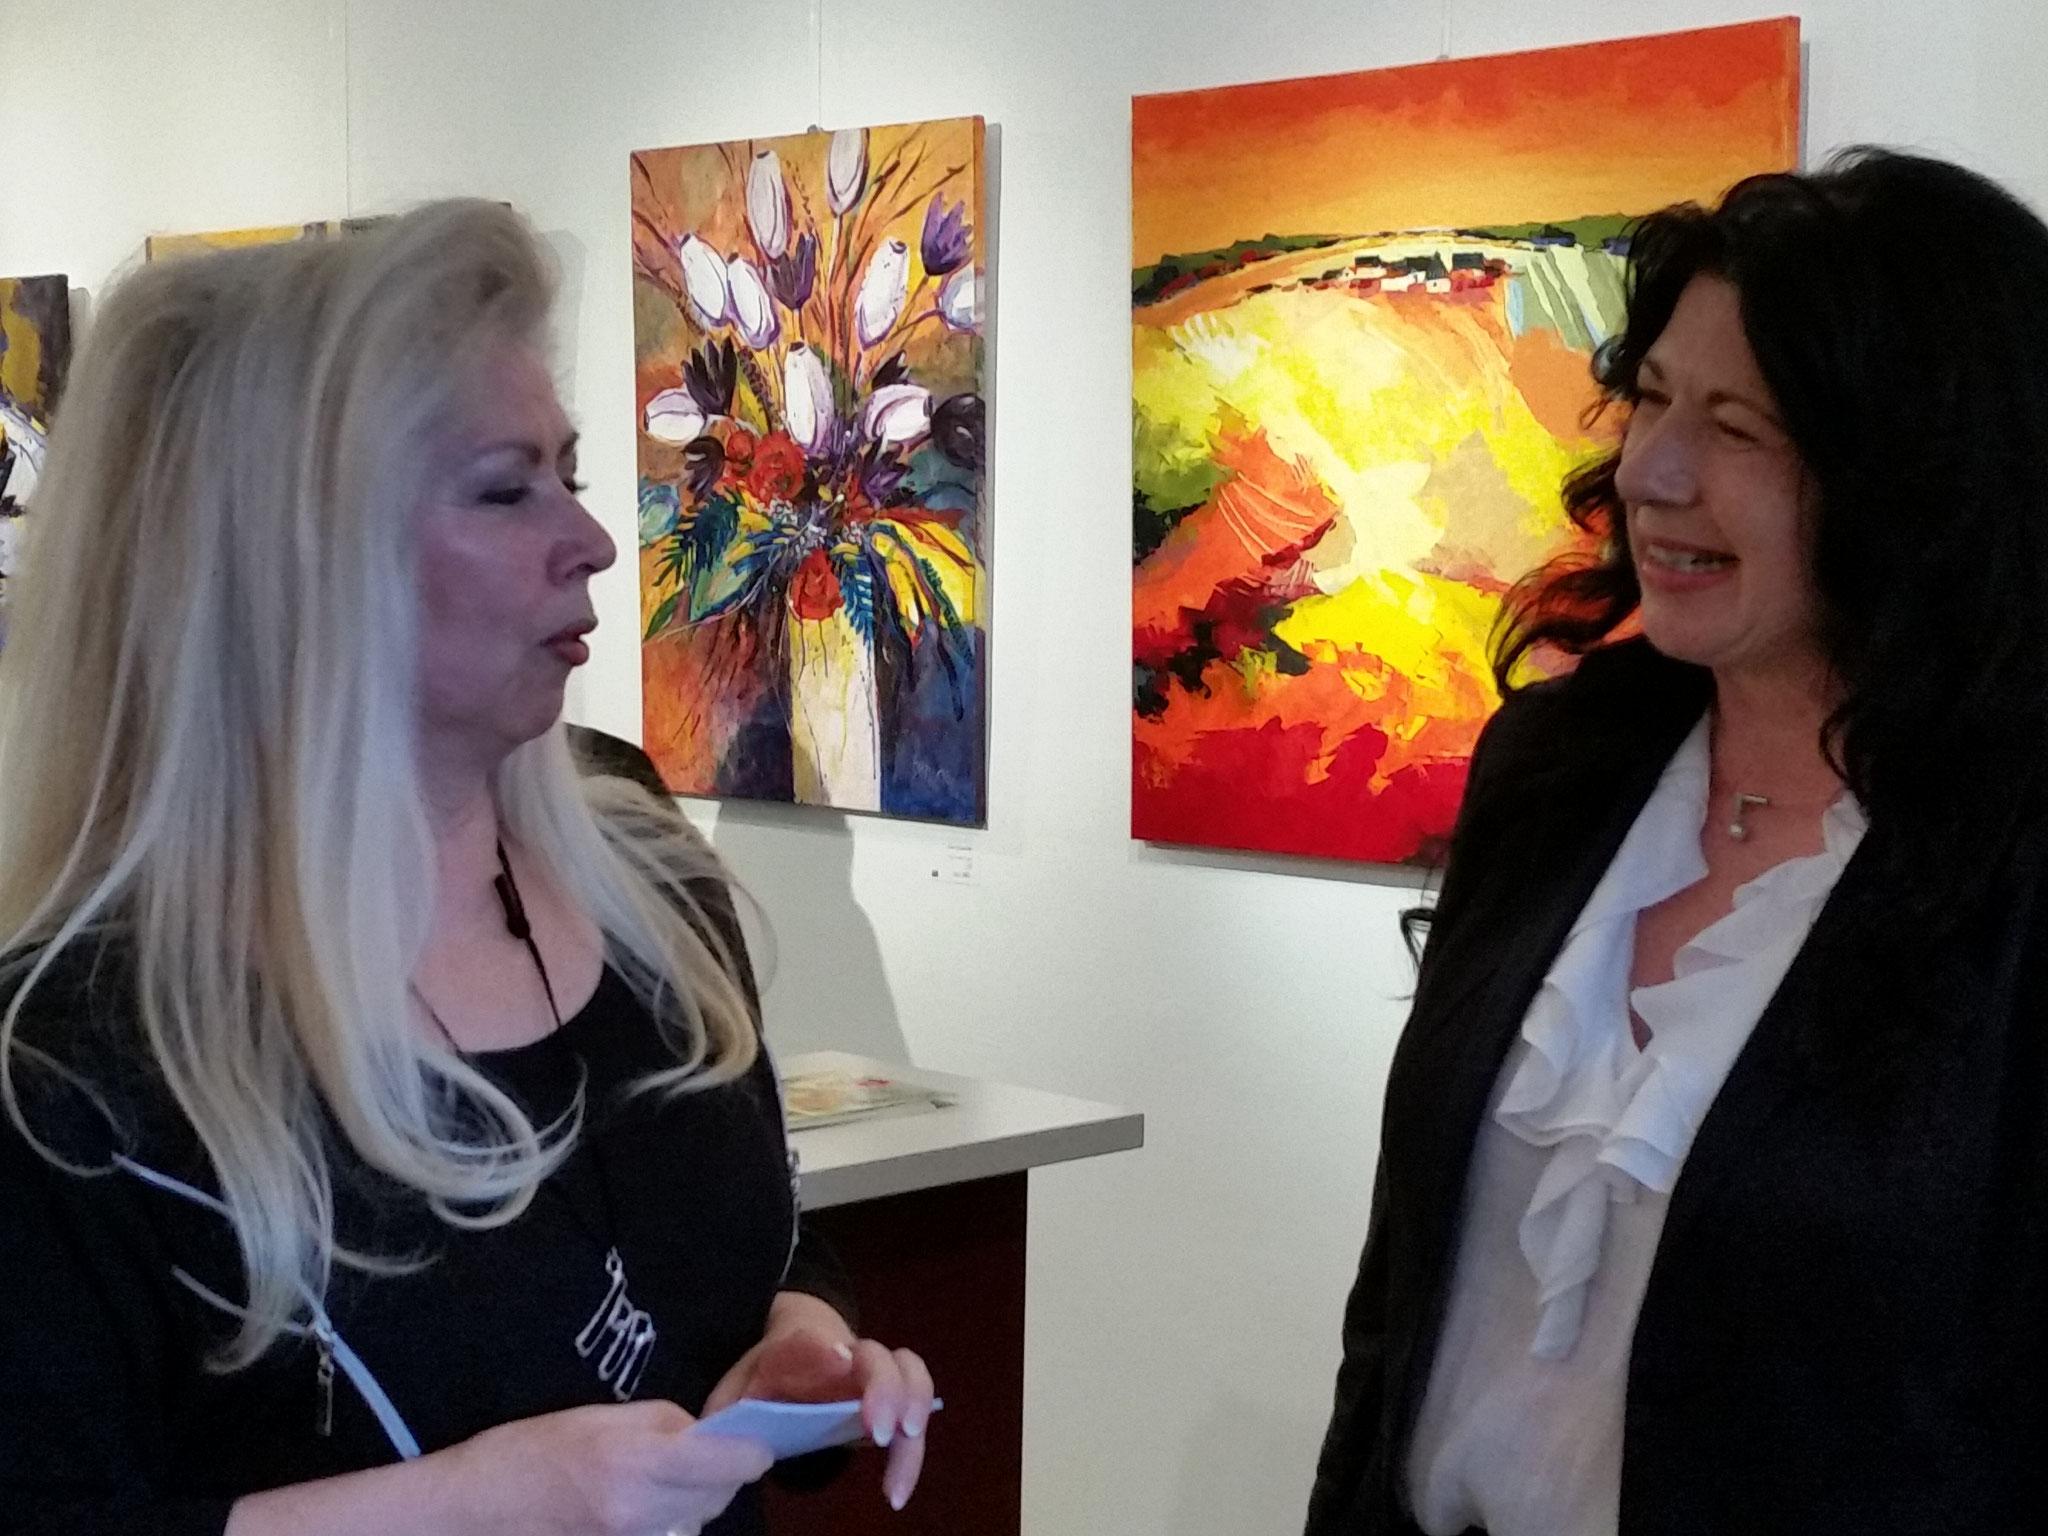 Lore Muth & Tanja Neipp